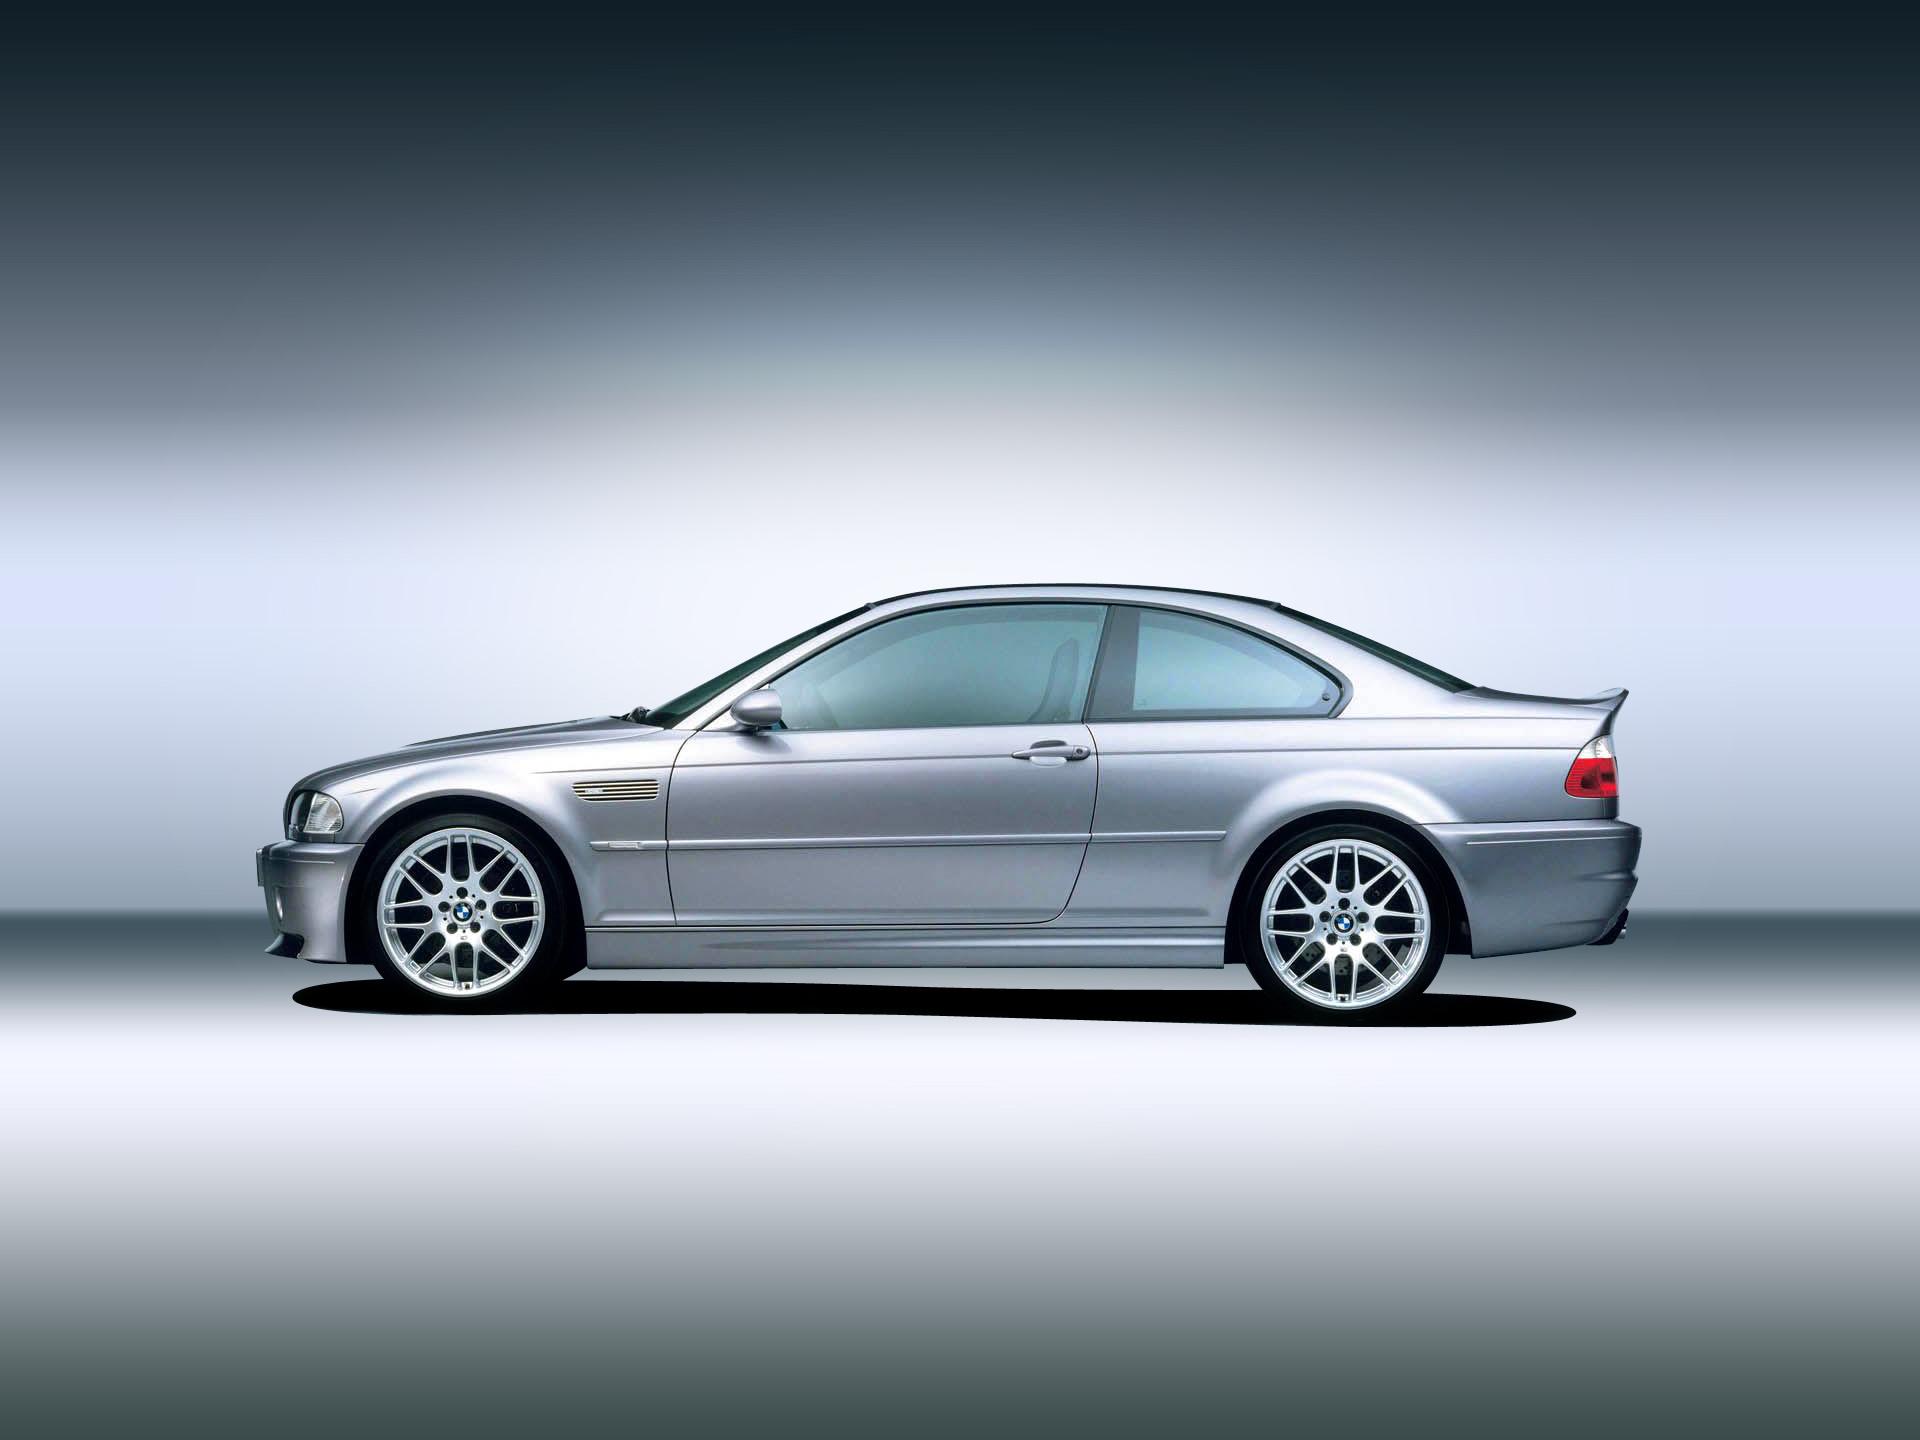 2003 BMW M3 CSL Wallpapers 1920x1440